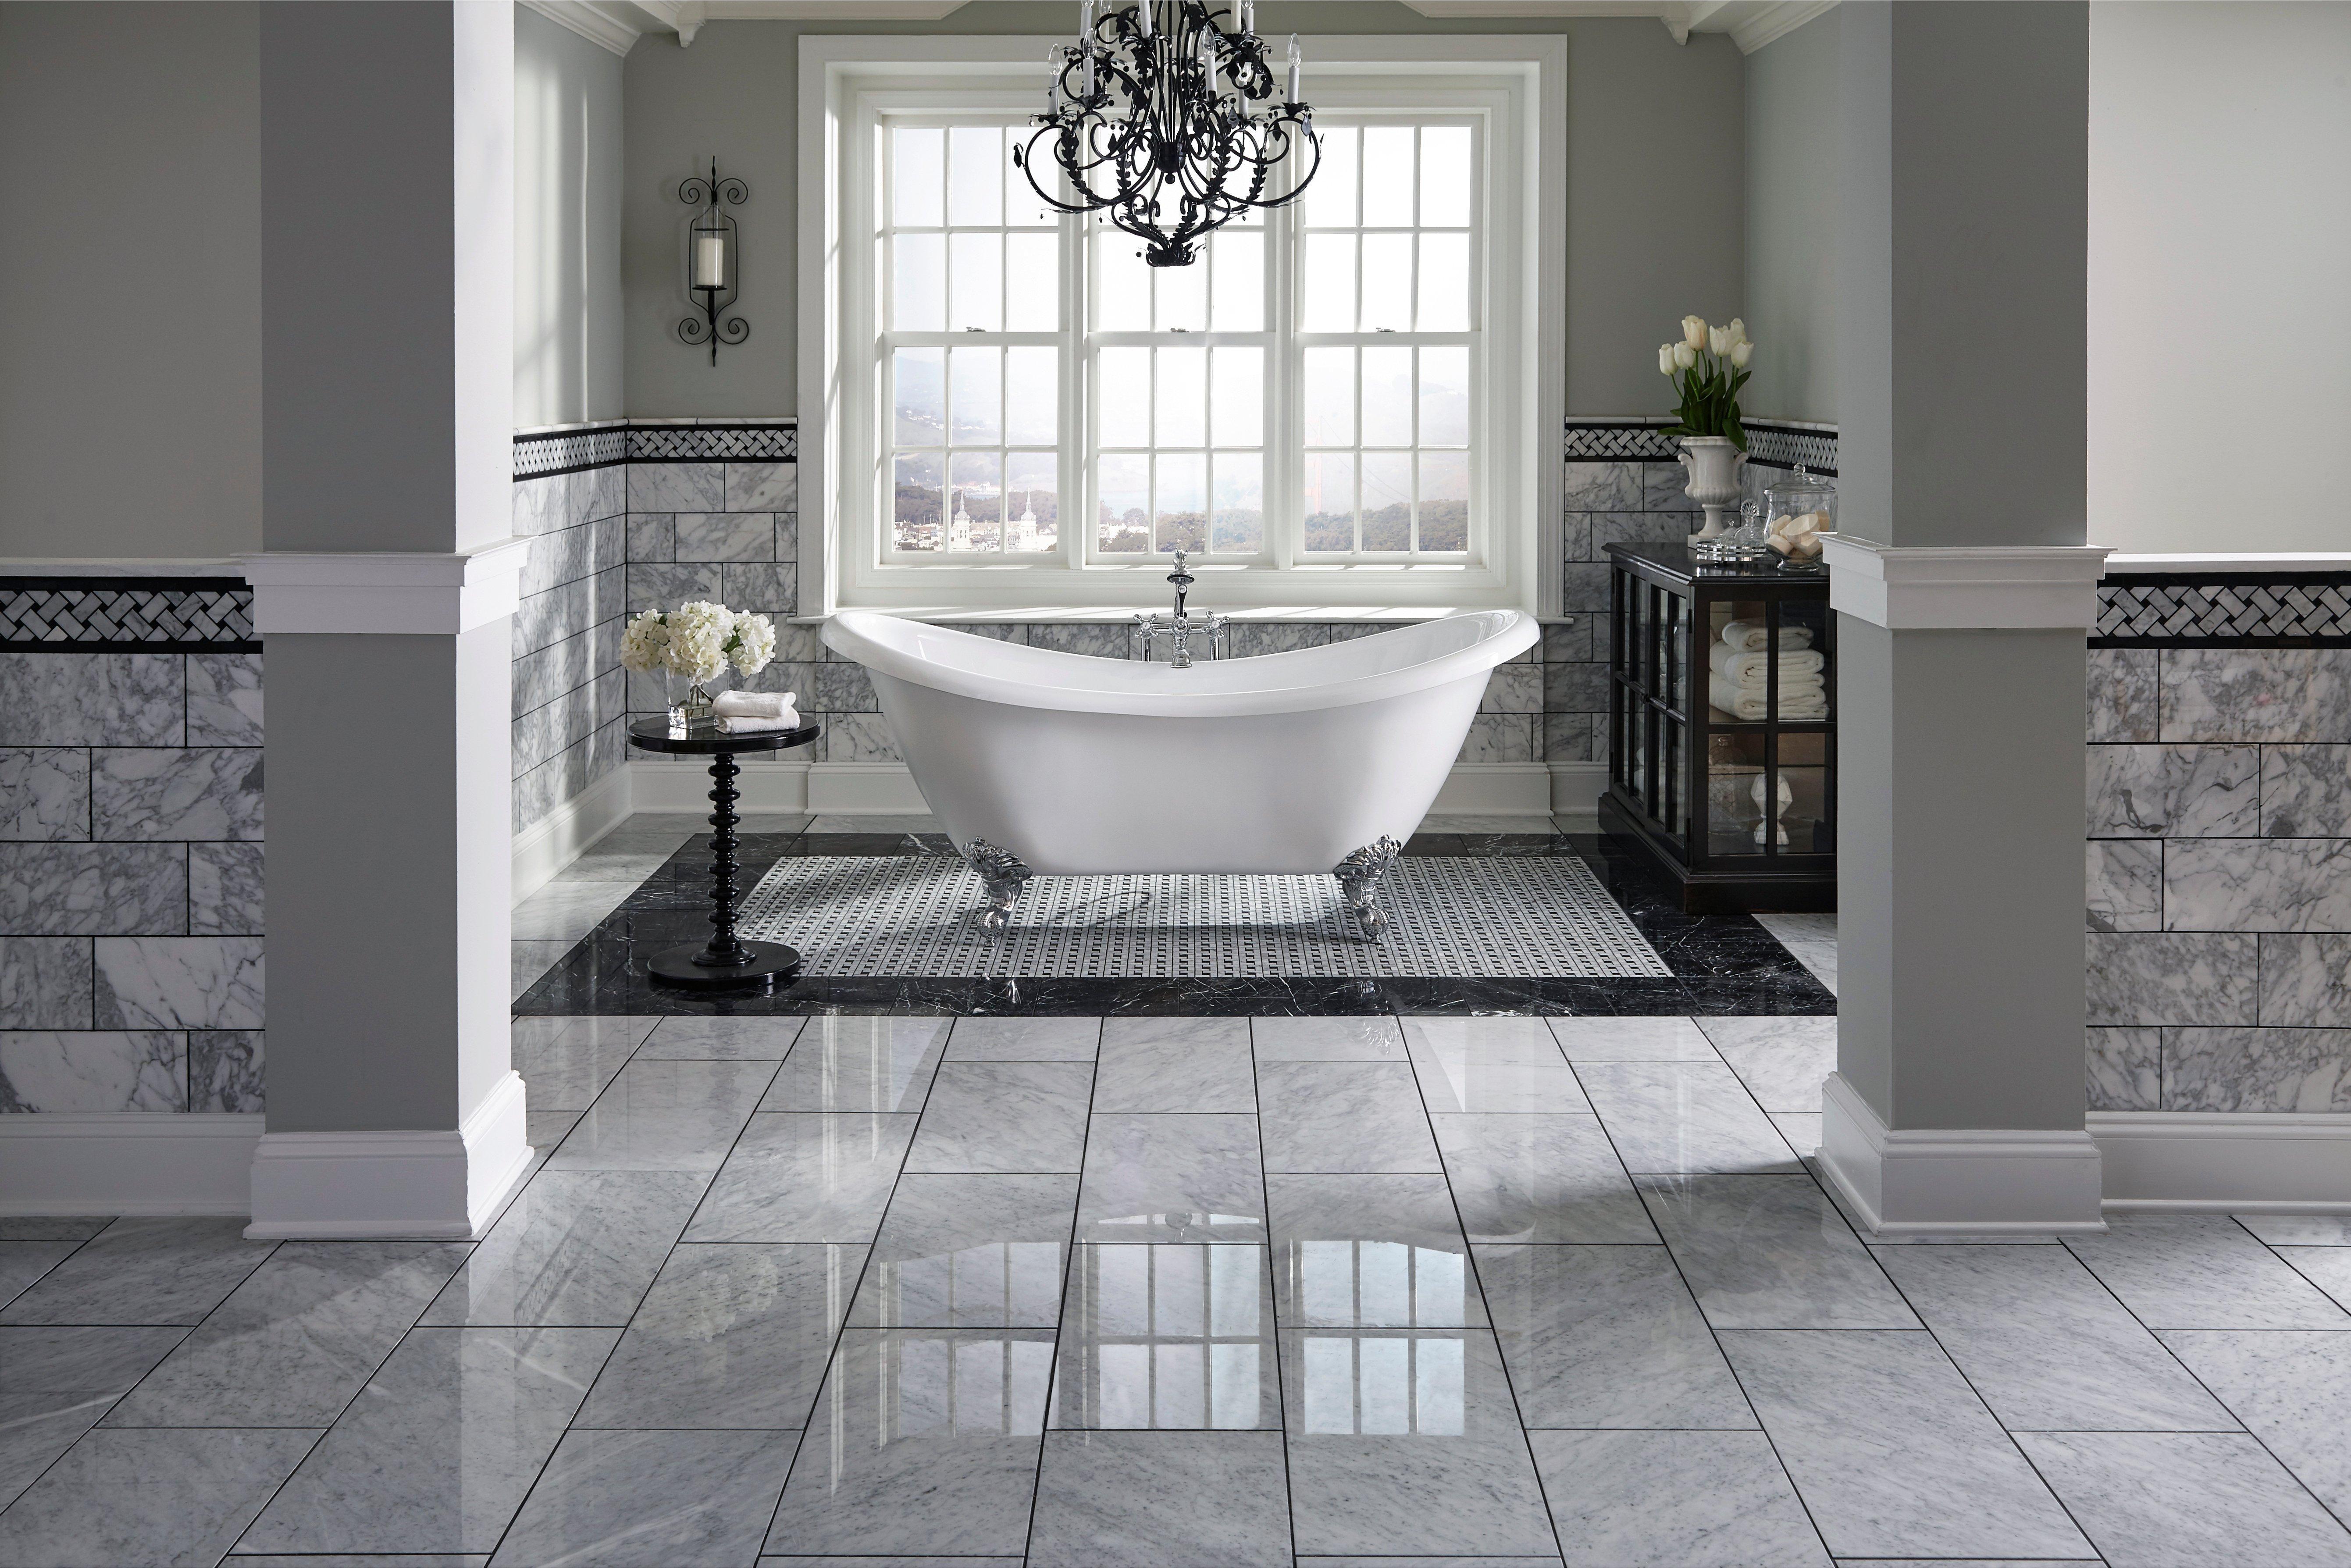 Carrara Marble Bianco Tile 12 X 24 White 5 8 Inch 16 Mm Thick Floor Decor In 2021 Amazing Bathrooms Modern Master Bathroom Bathroom Design